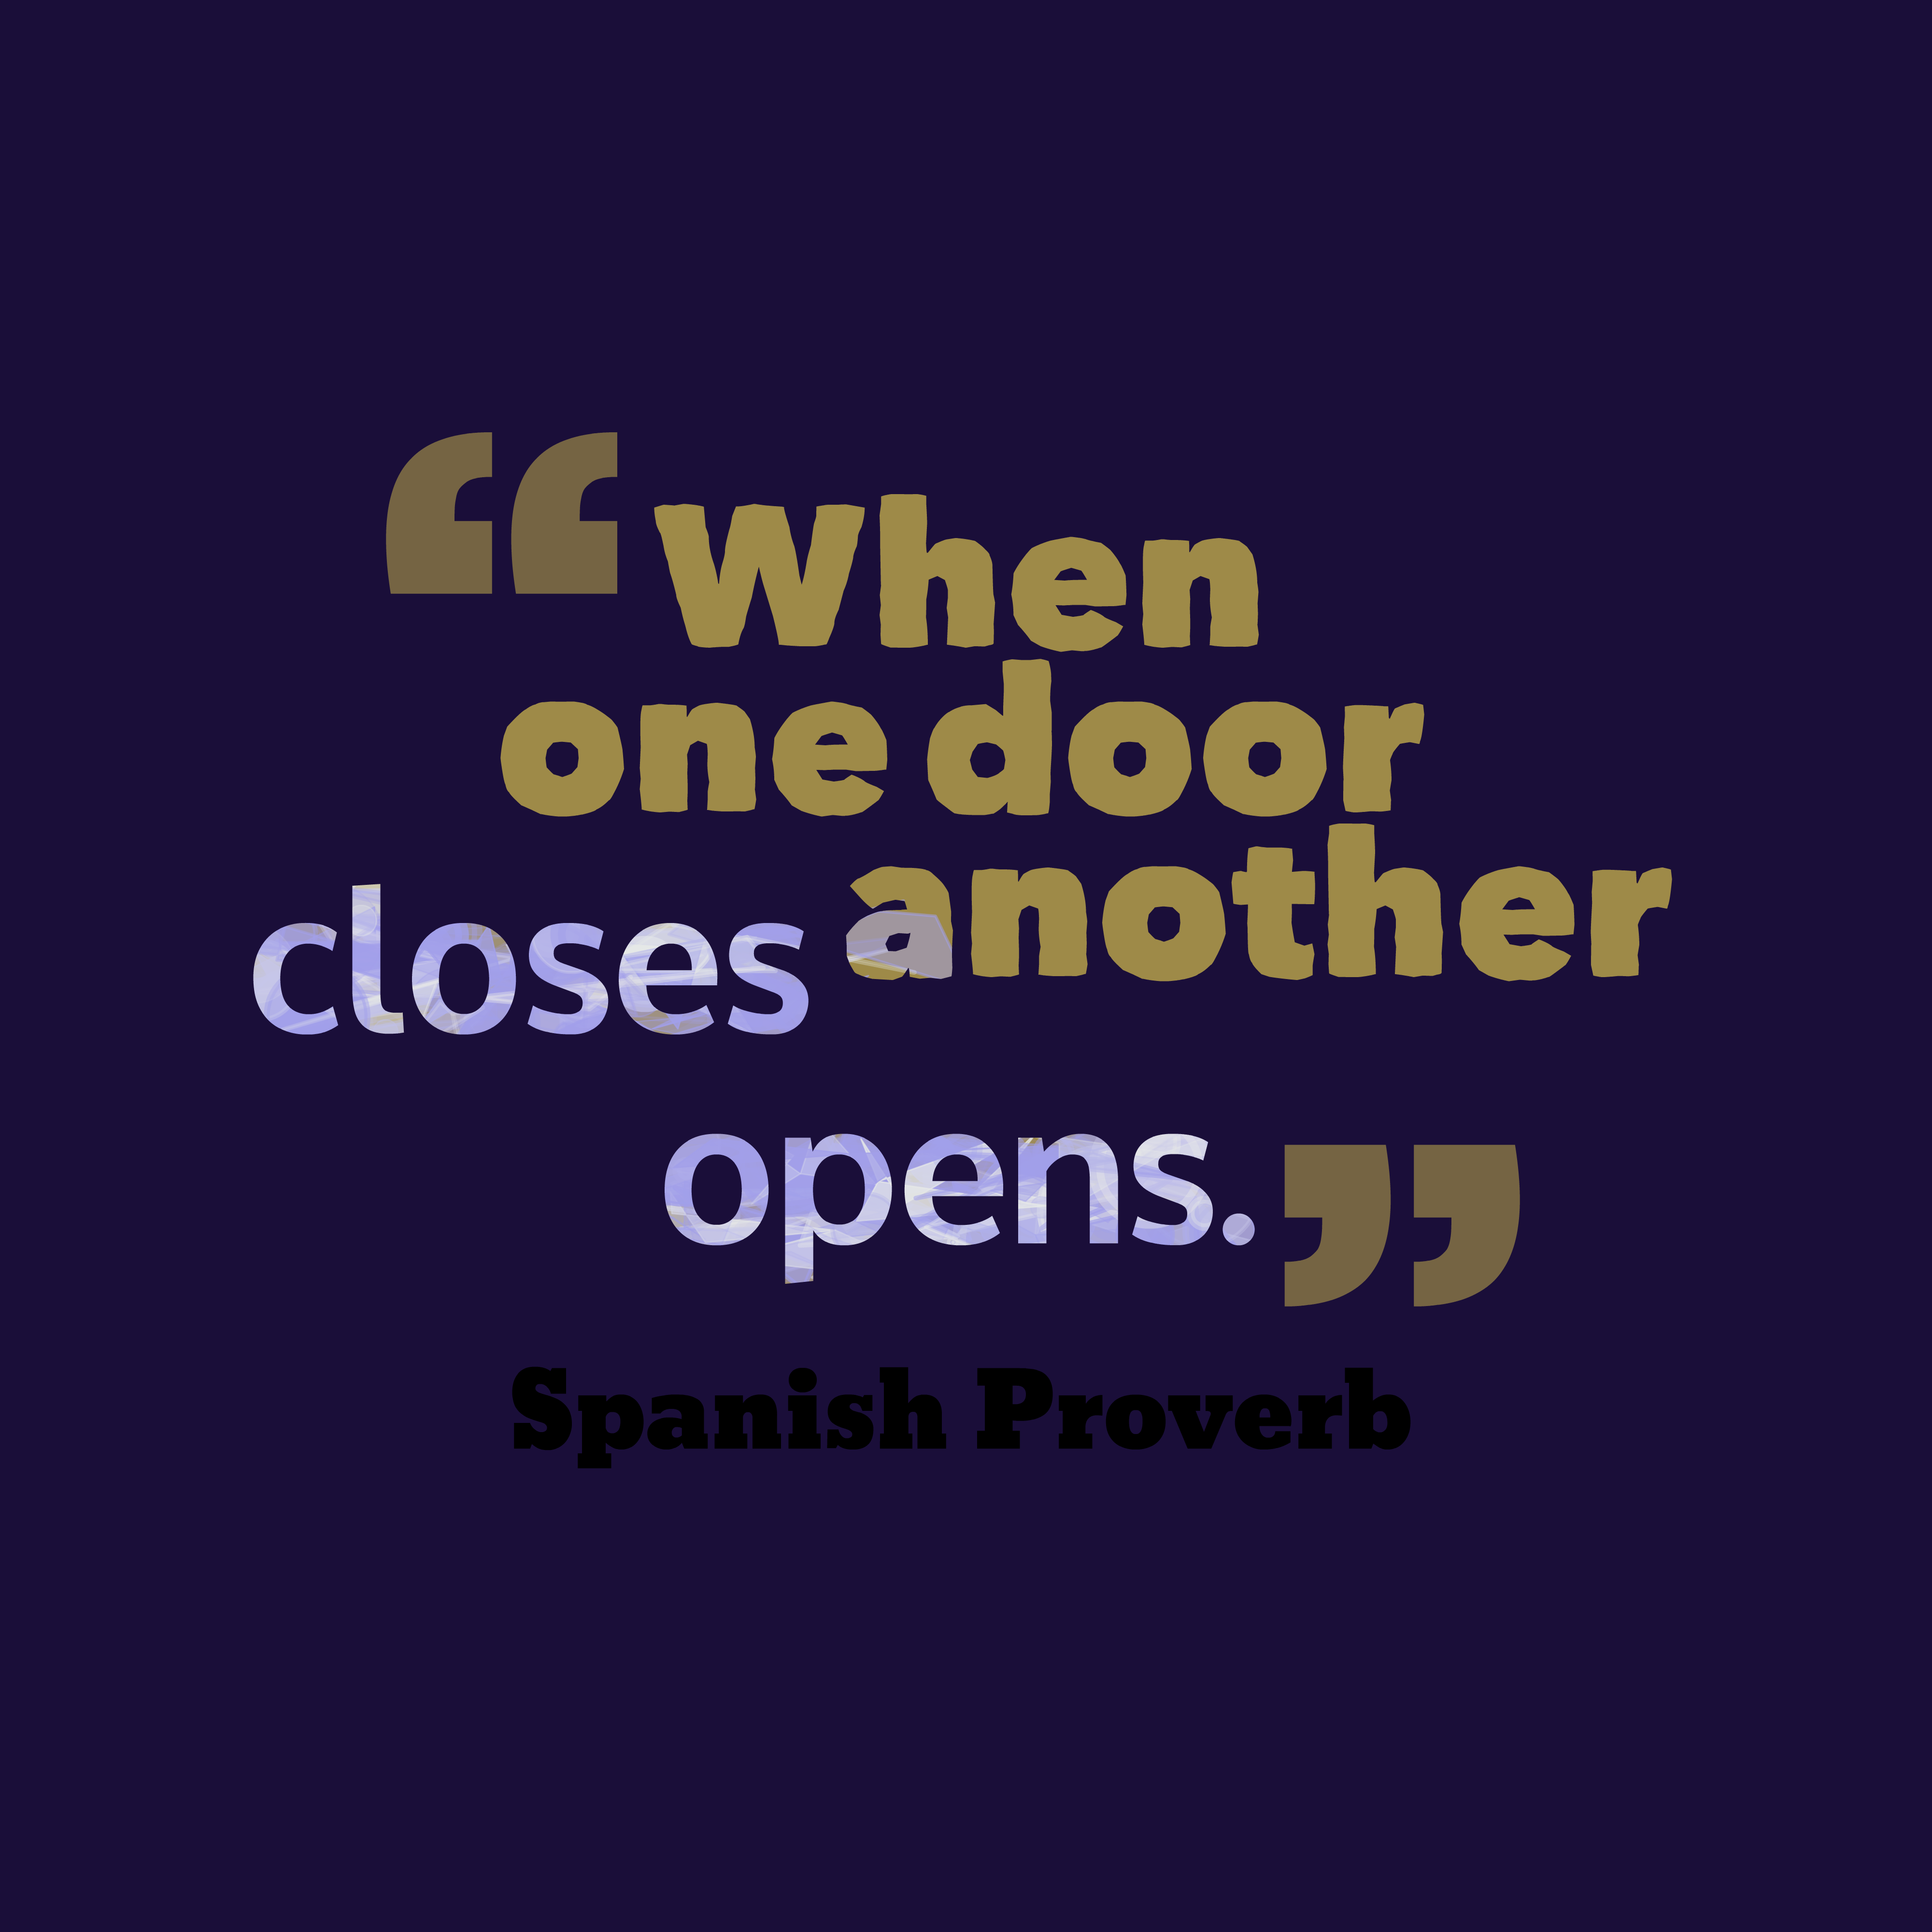 Spanish Wisdom About Change